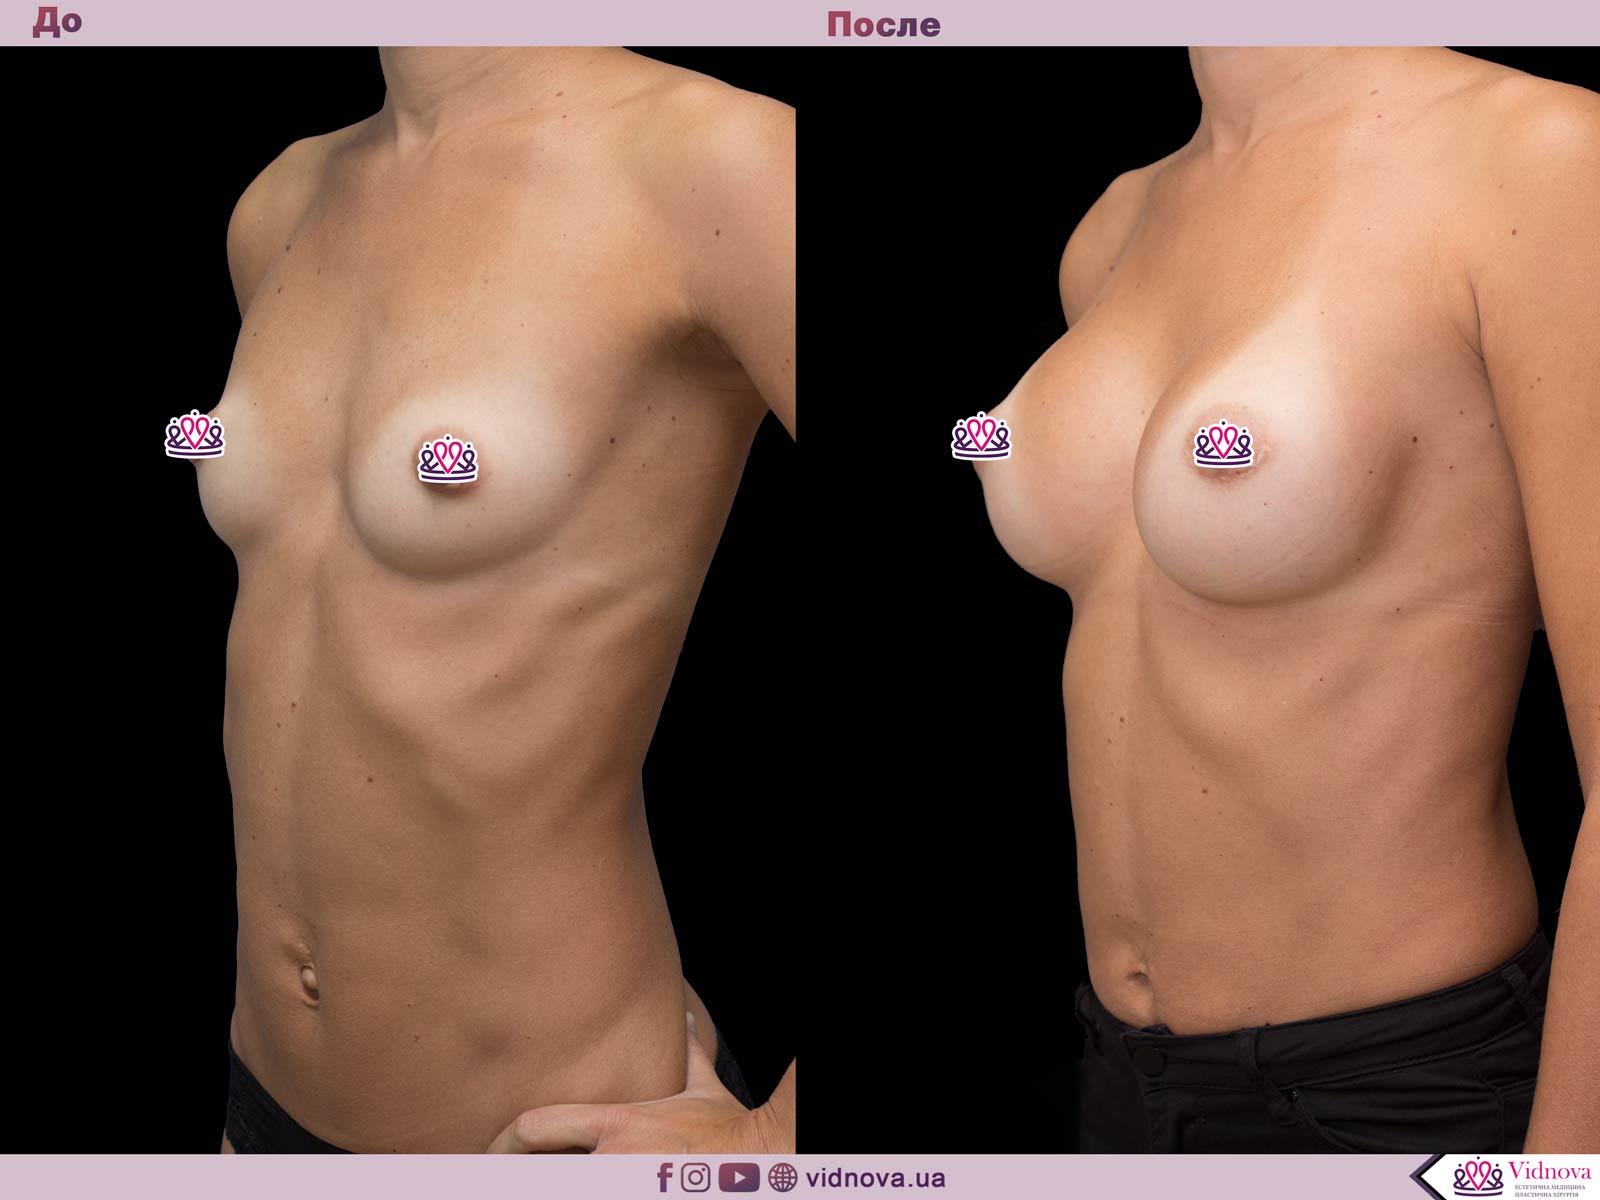 Увеличение груди: Фото ДО и ПОСЛЕ - Пример №39-2 - Клиника Vidnova